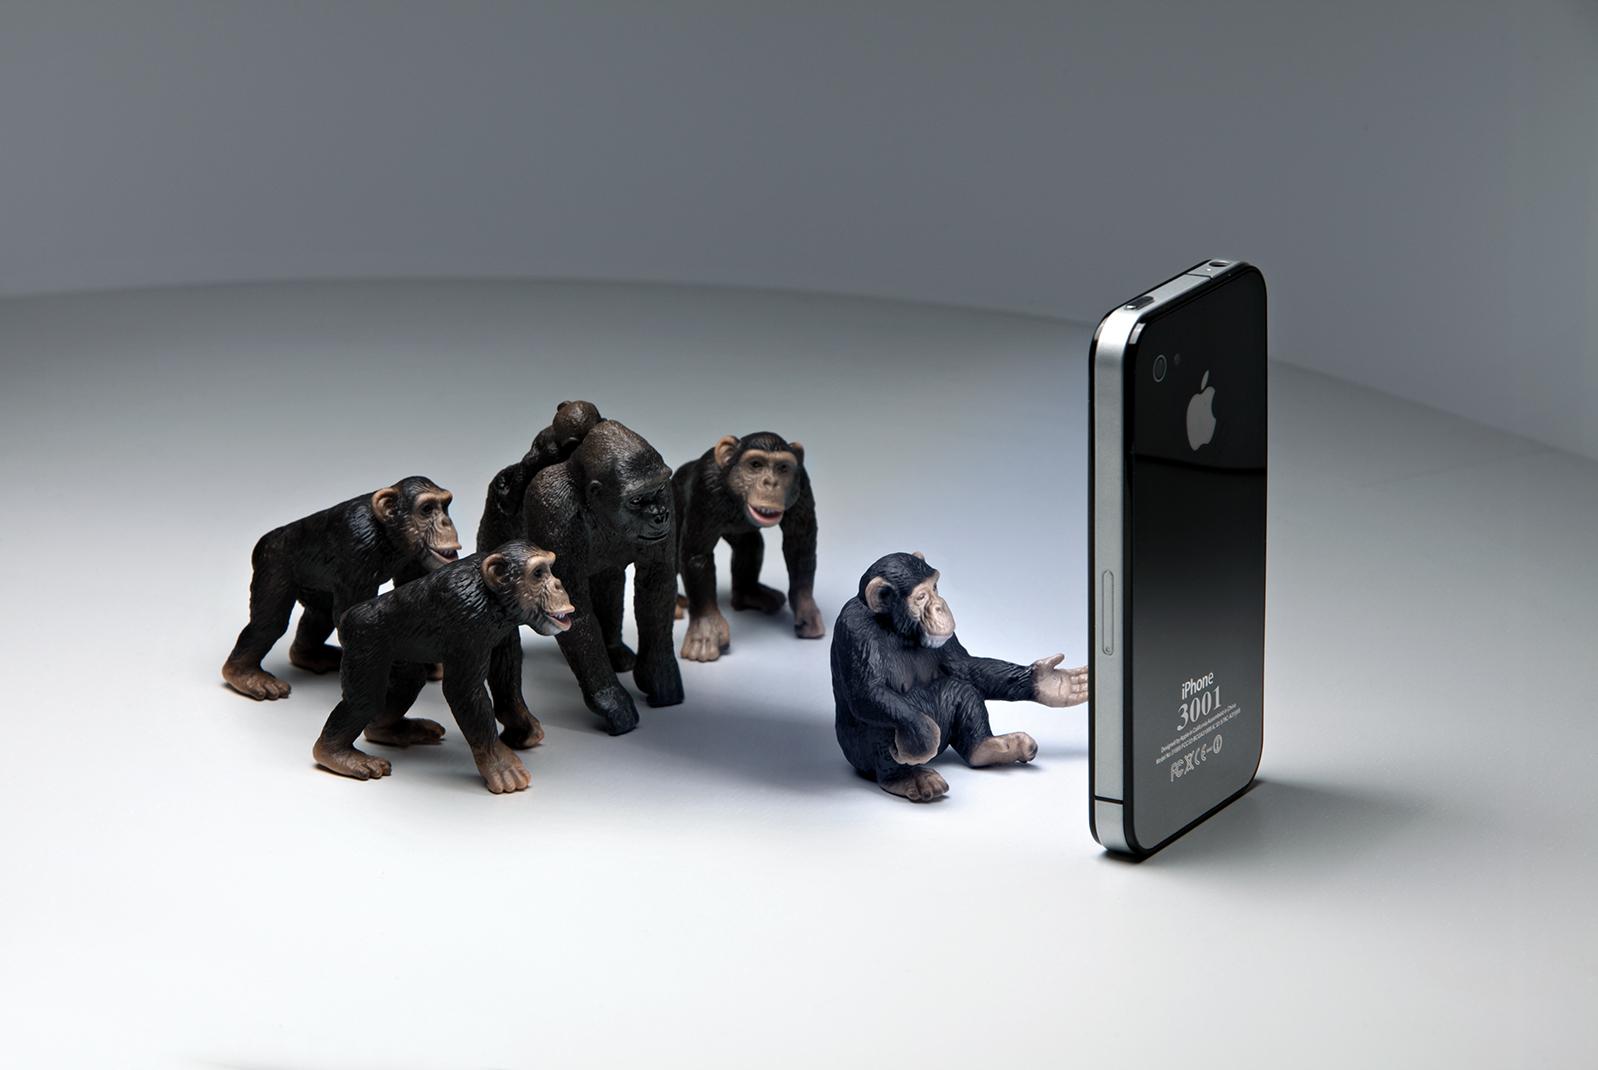 Monkey Phone # 60